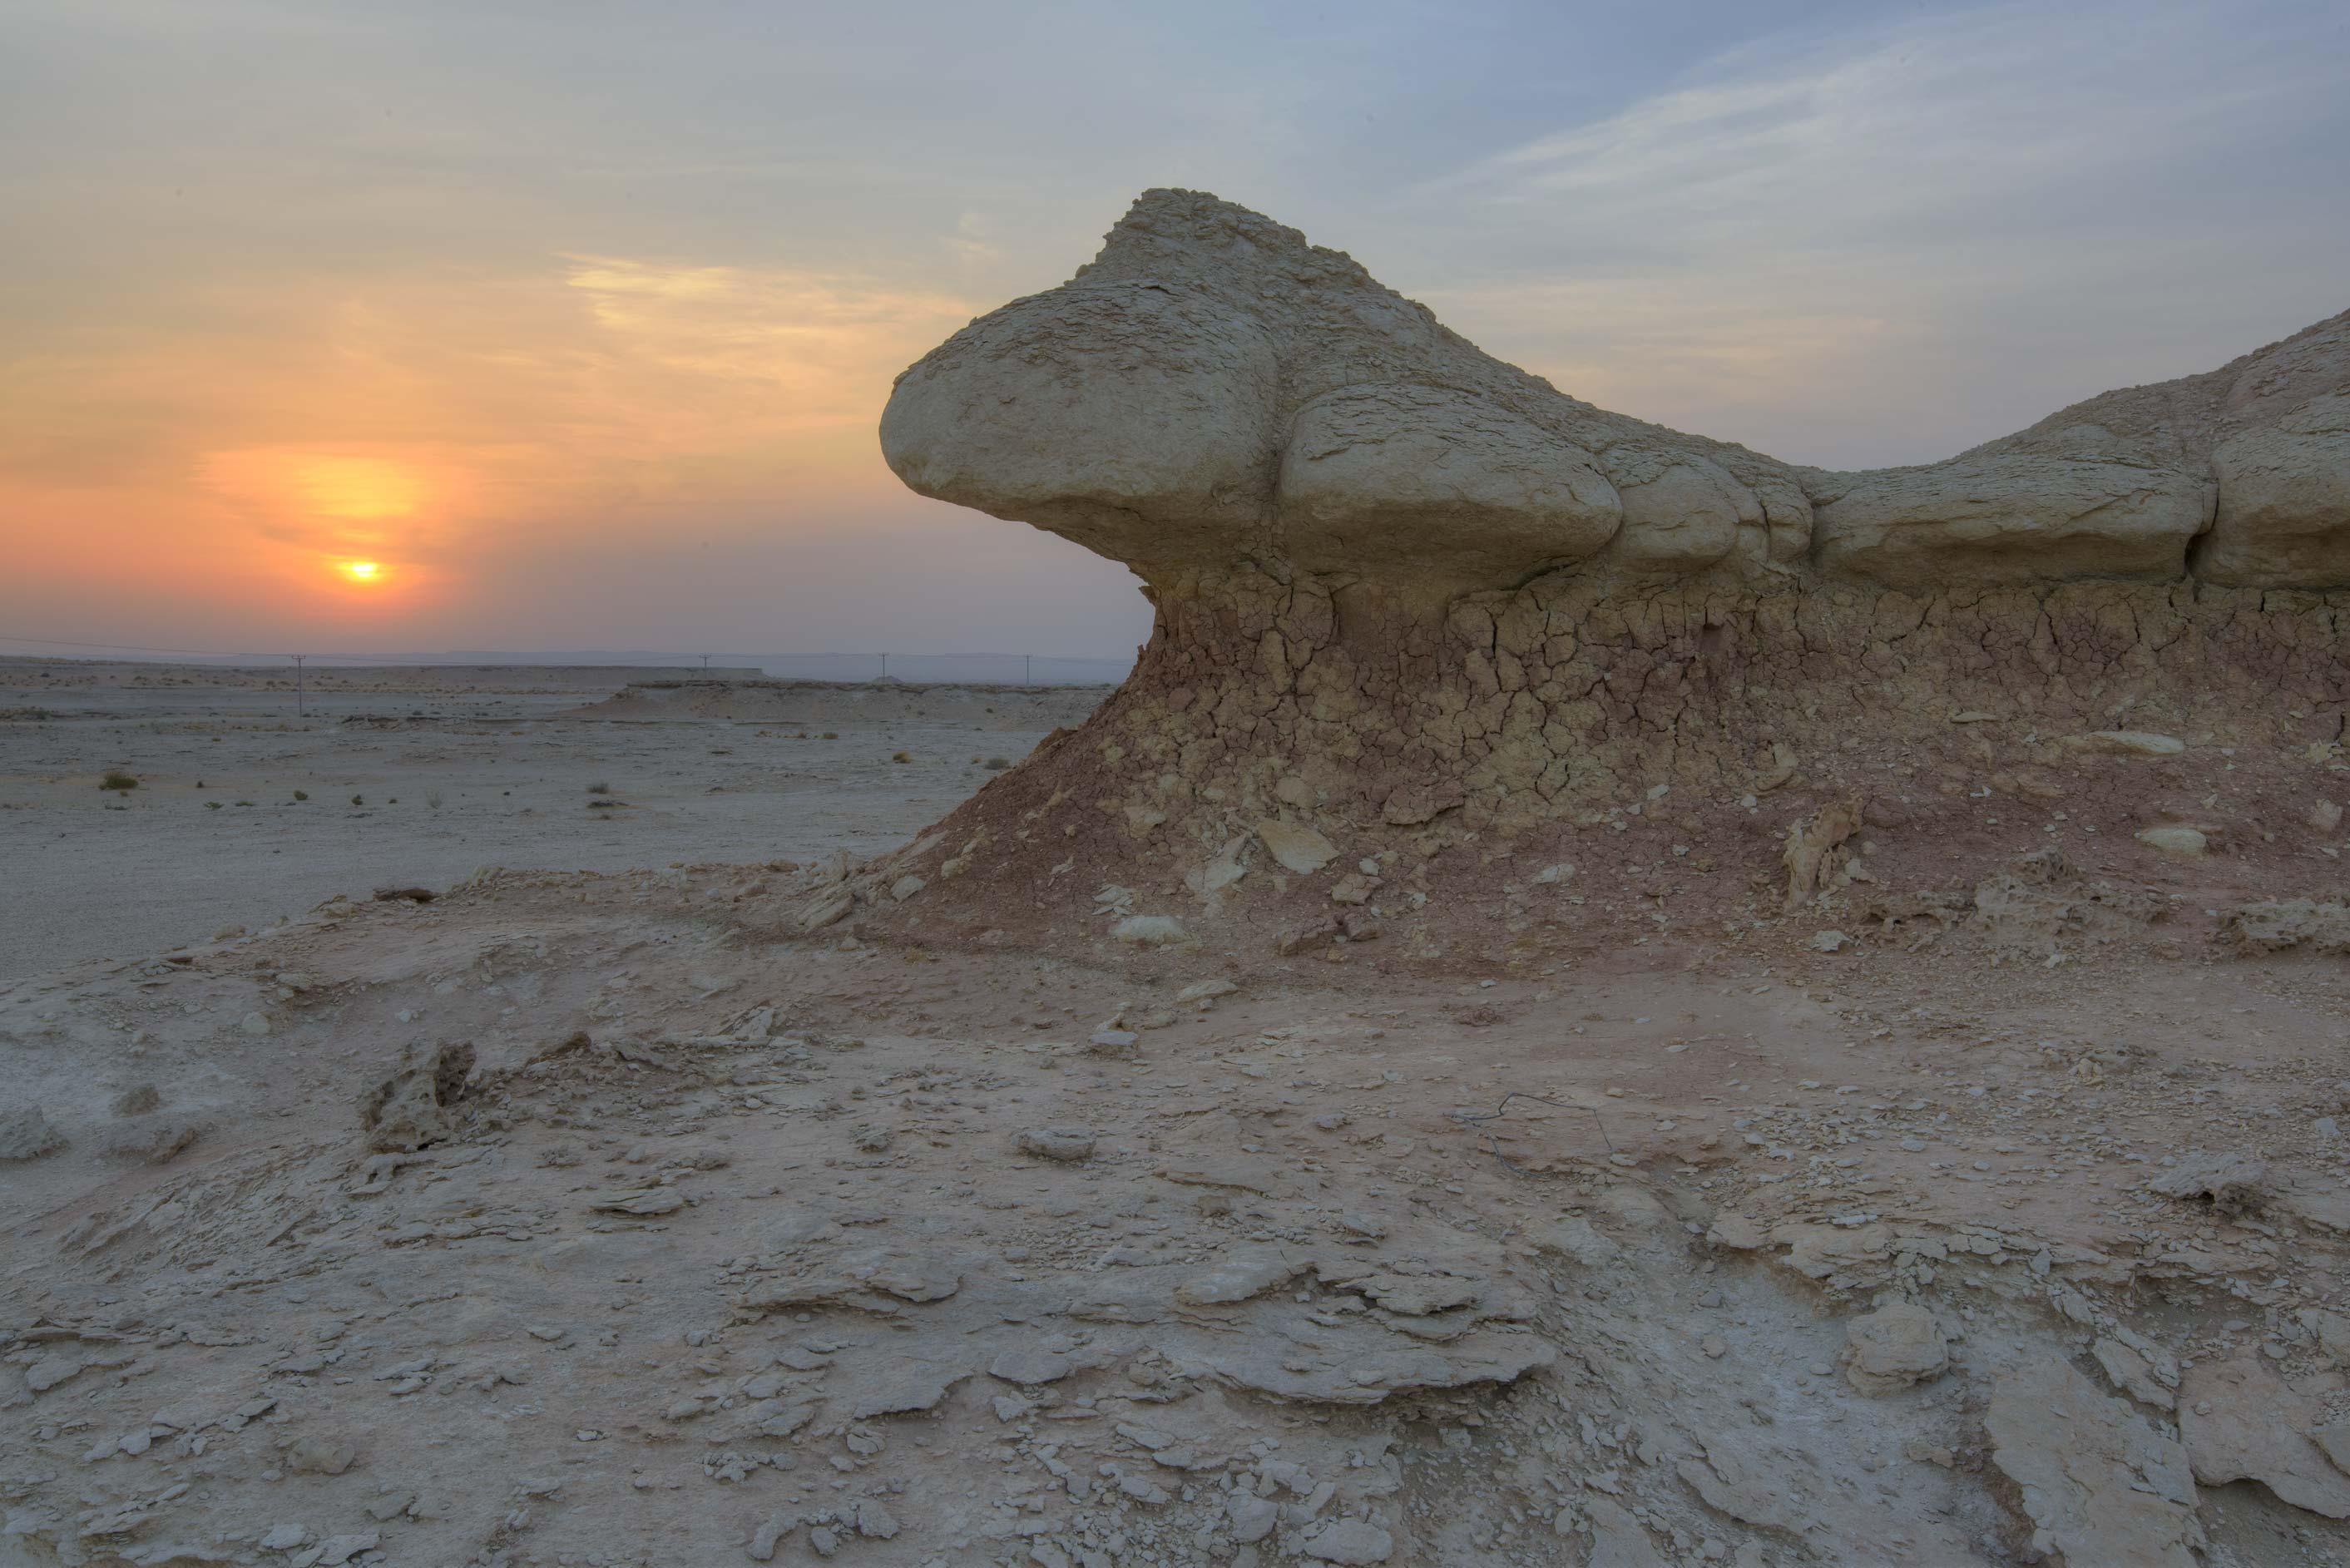 Photo 1843-01: Wind erosion of limestone cliffs in ...